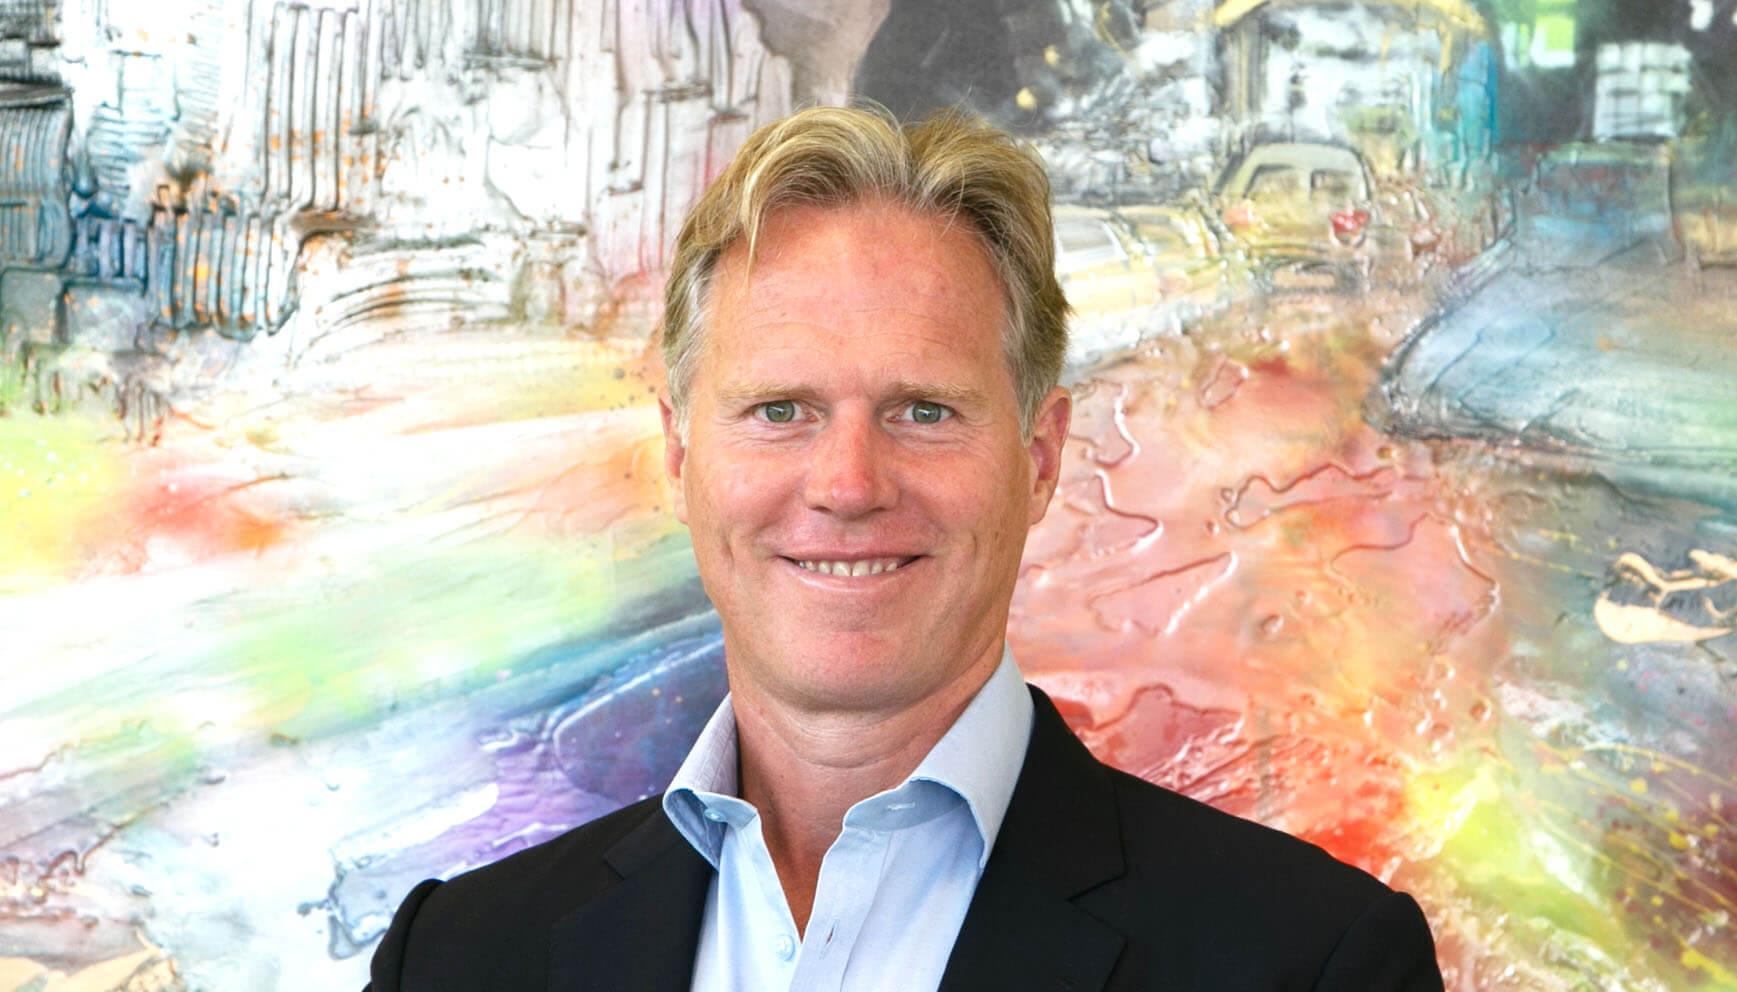 Image of David Juxon, Senior Adviser at Peregrine Communications